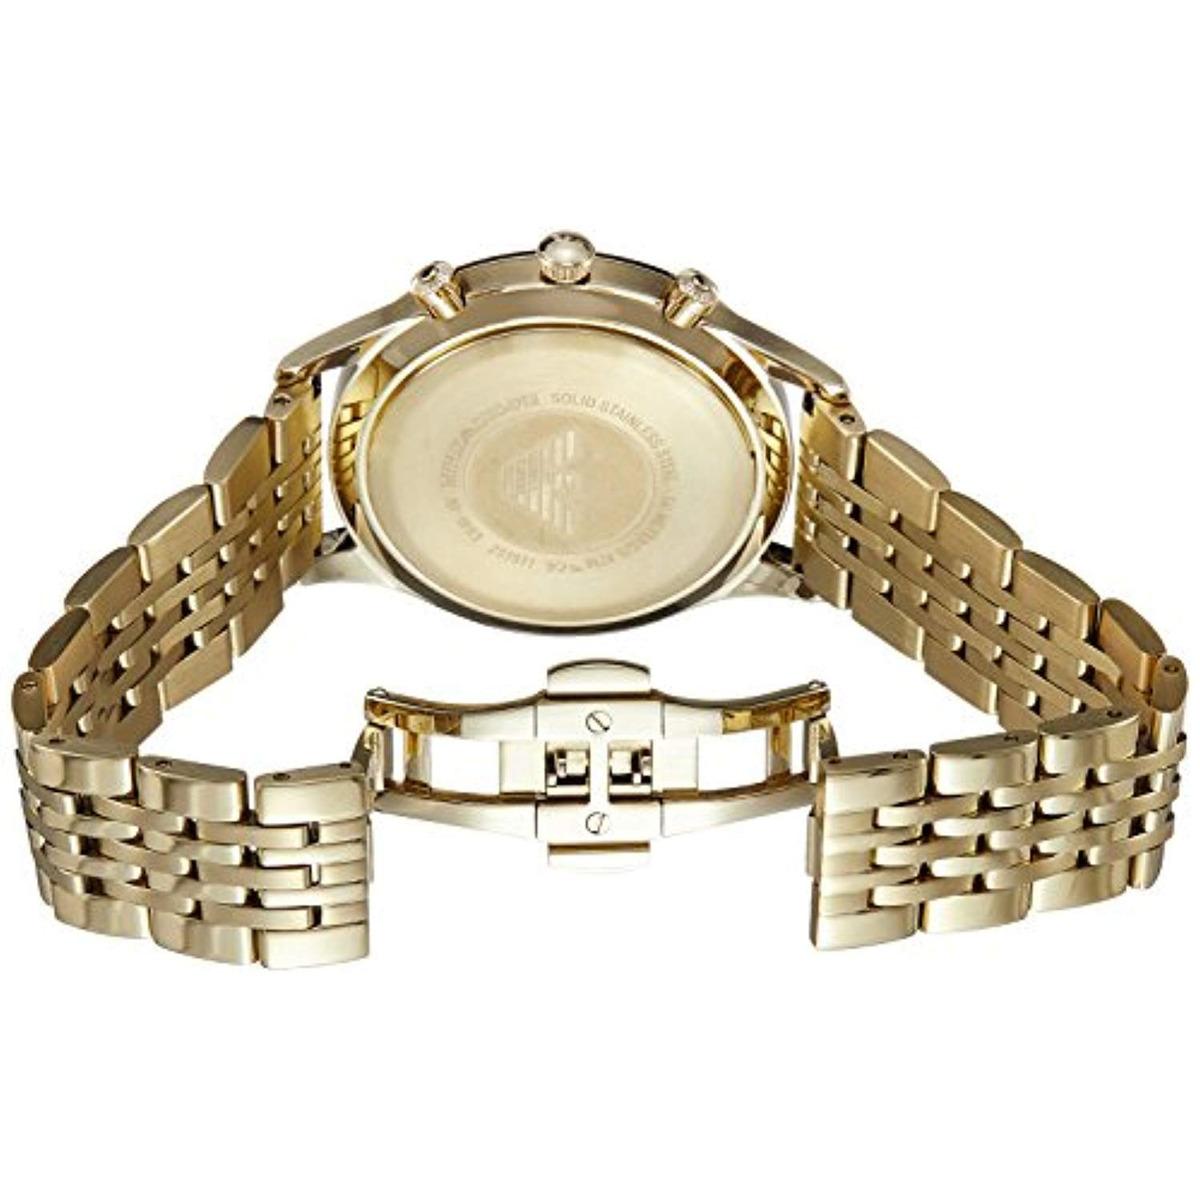 1b741c81e582 reloj hombre vestido ar1893 de hombre emporio armani dorado. Cargando zoom.